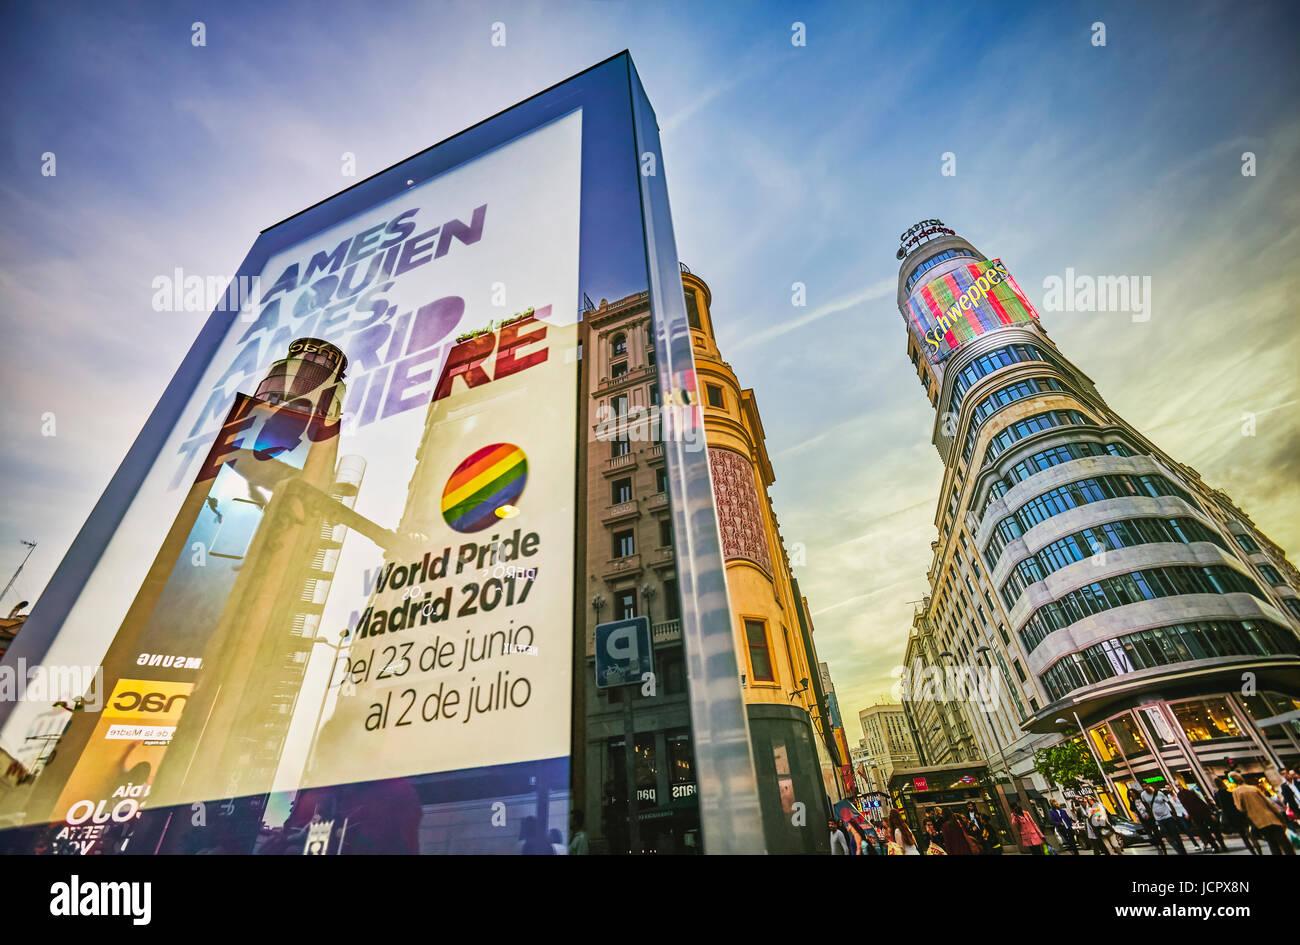 World Pride Madrid 2017 sign at Callao Square. Madrid. Spain. - Stock Image